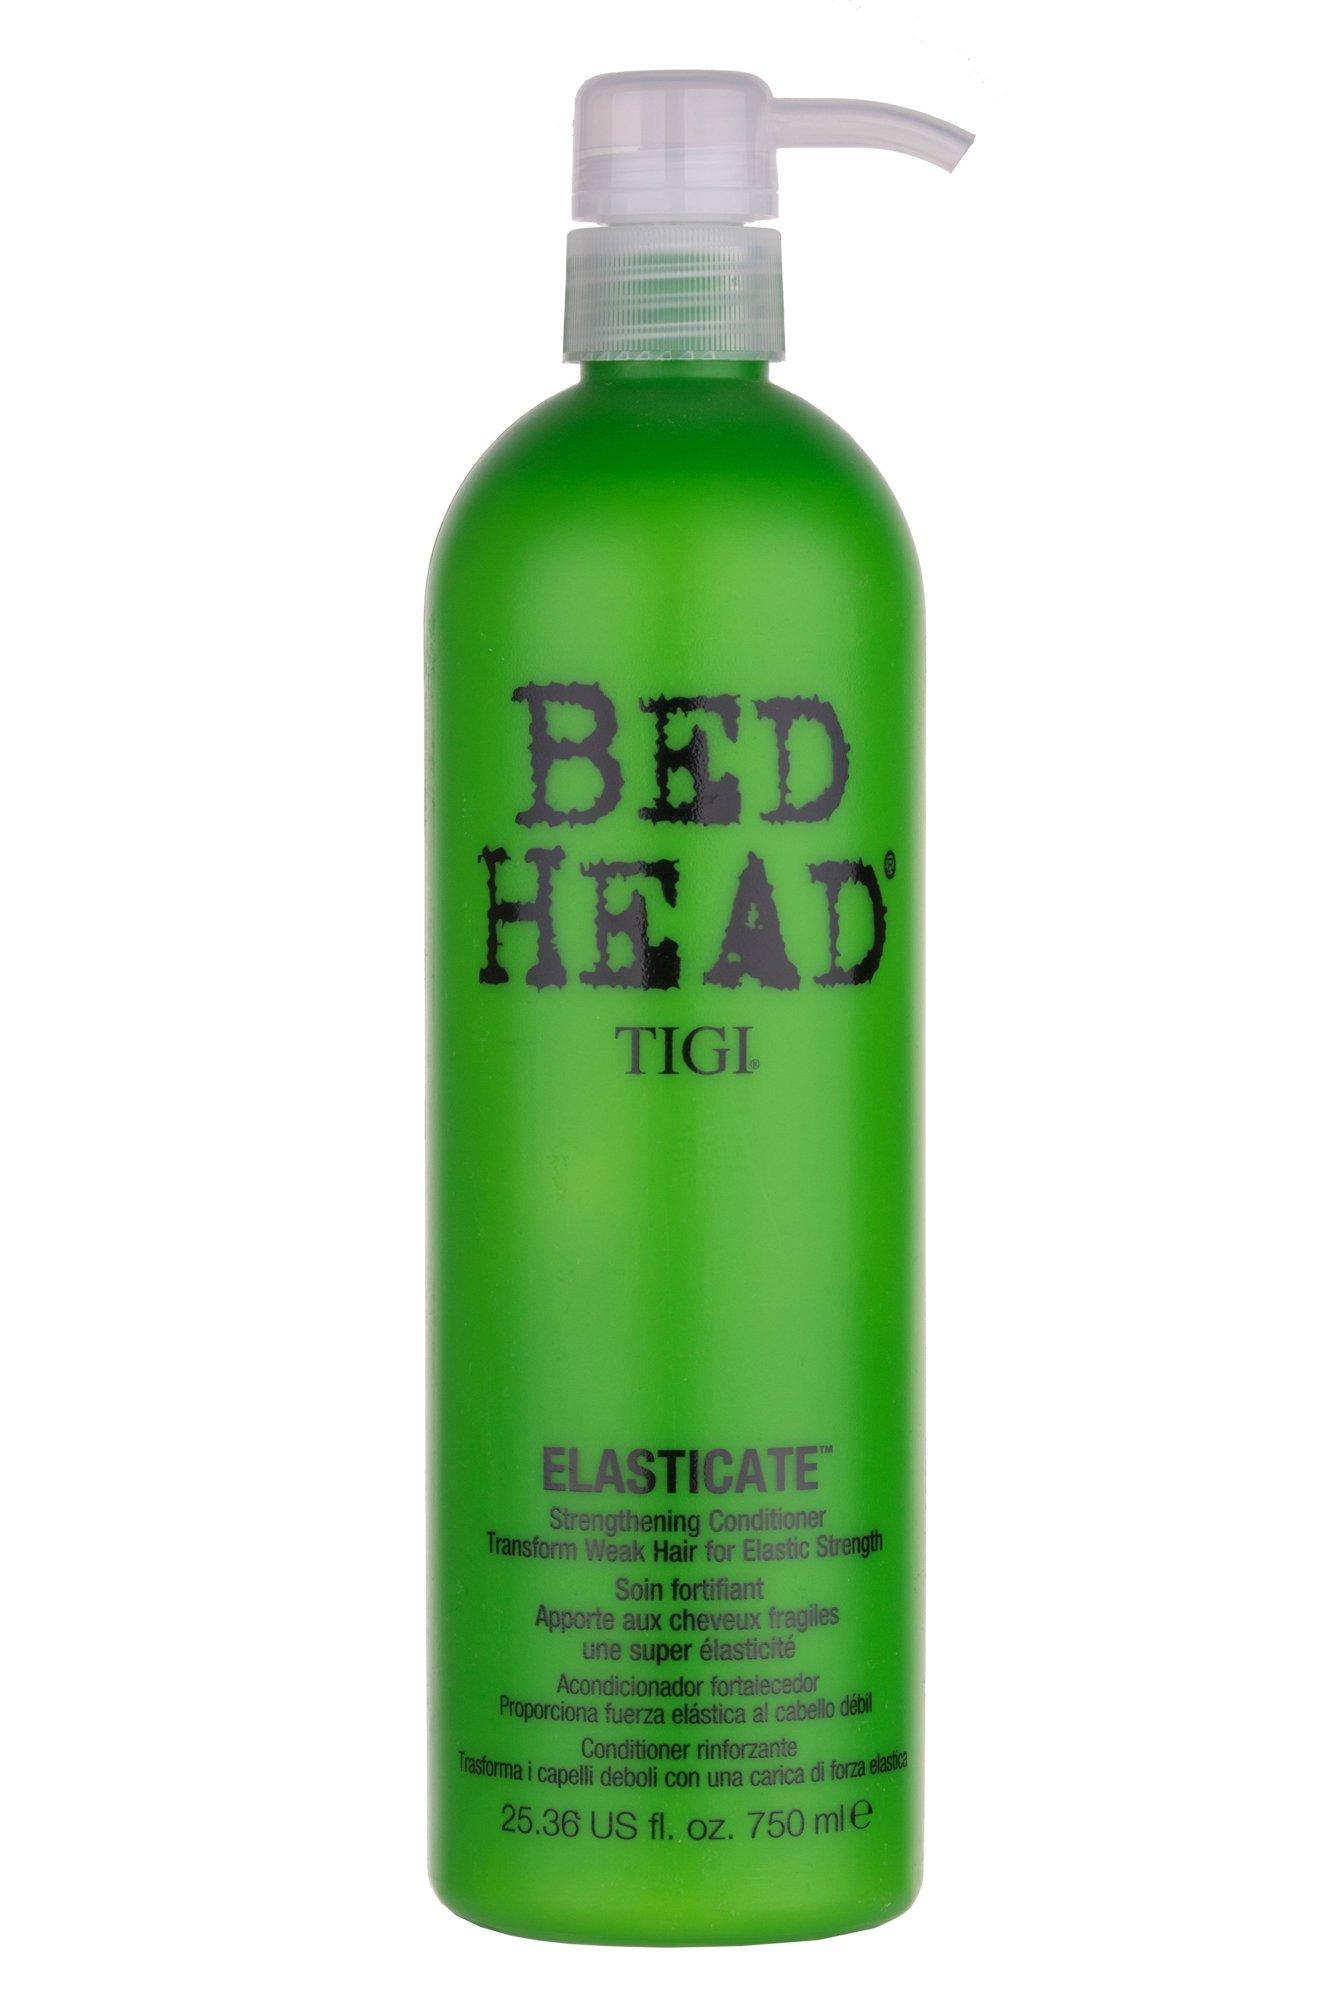 Tigi Bed Head Elasticate Cosmetic 750ml